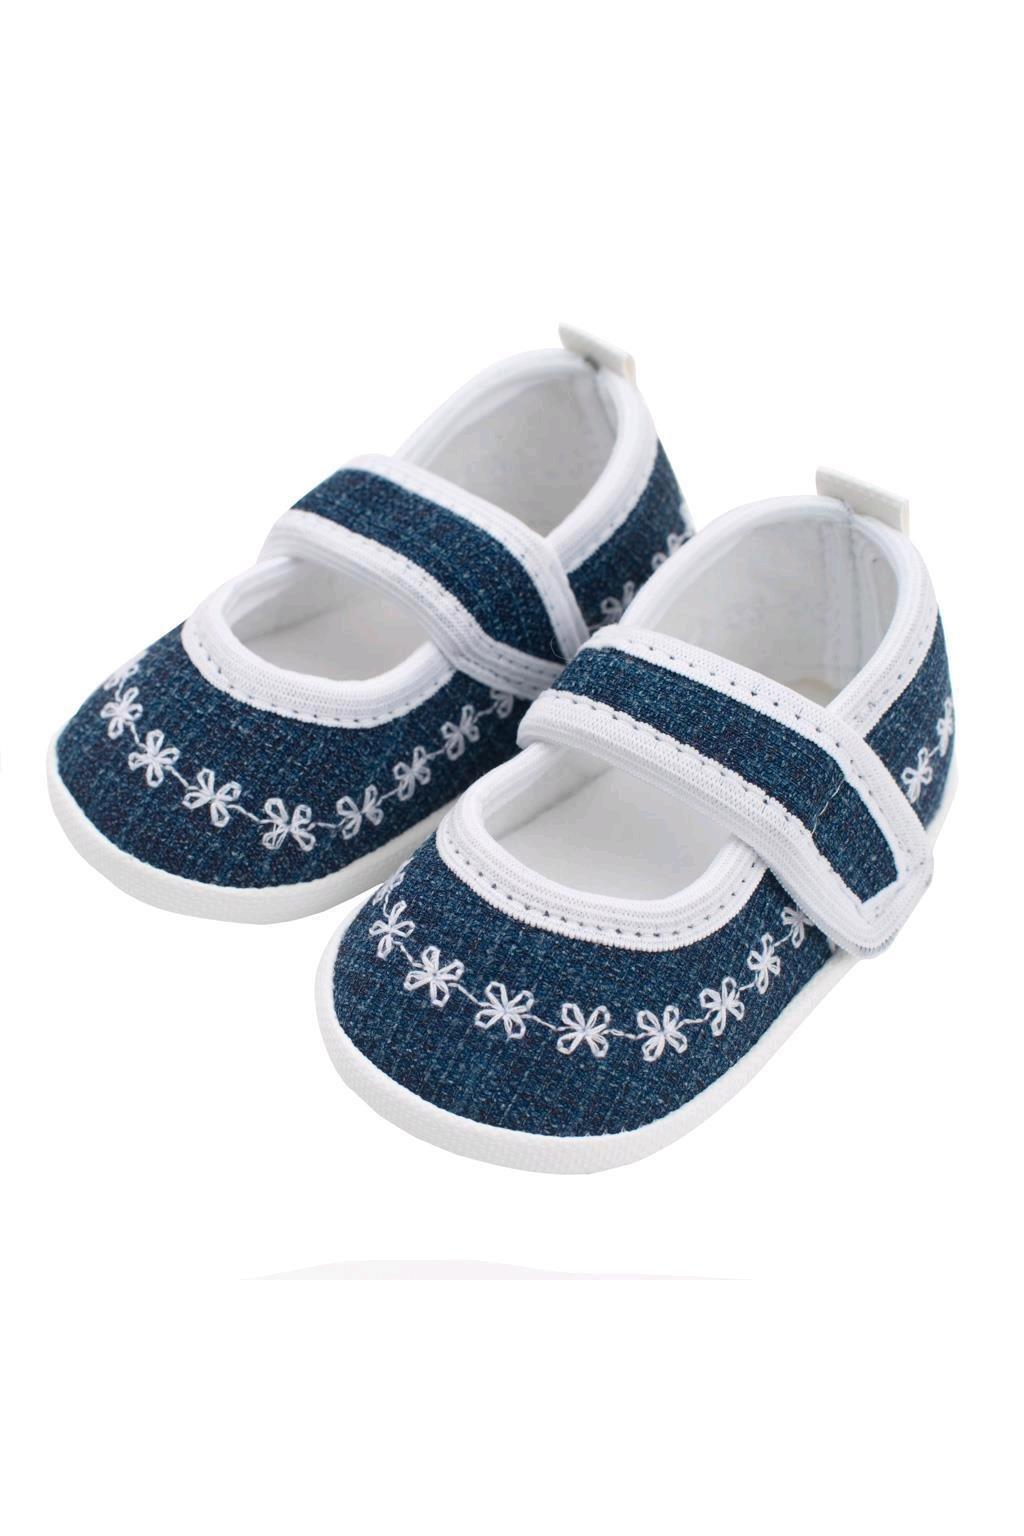 Dojčenské capačky New Baby Jeans biele 12-18 m